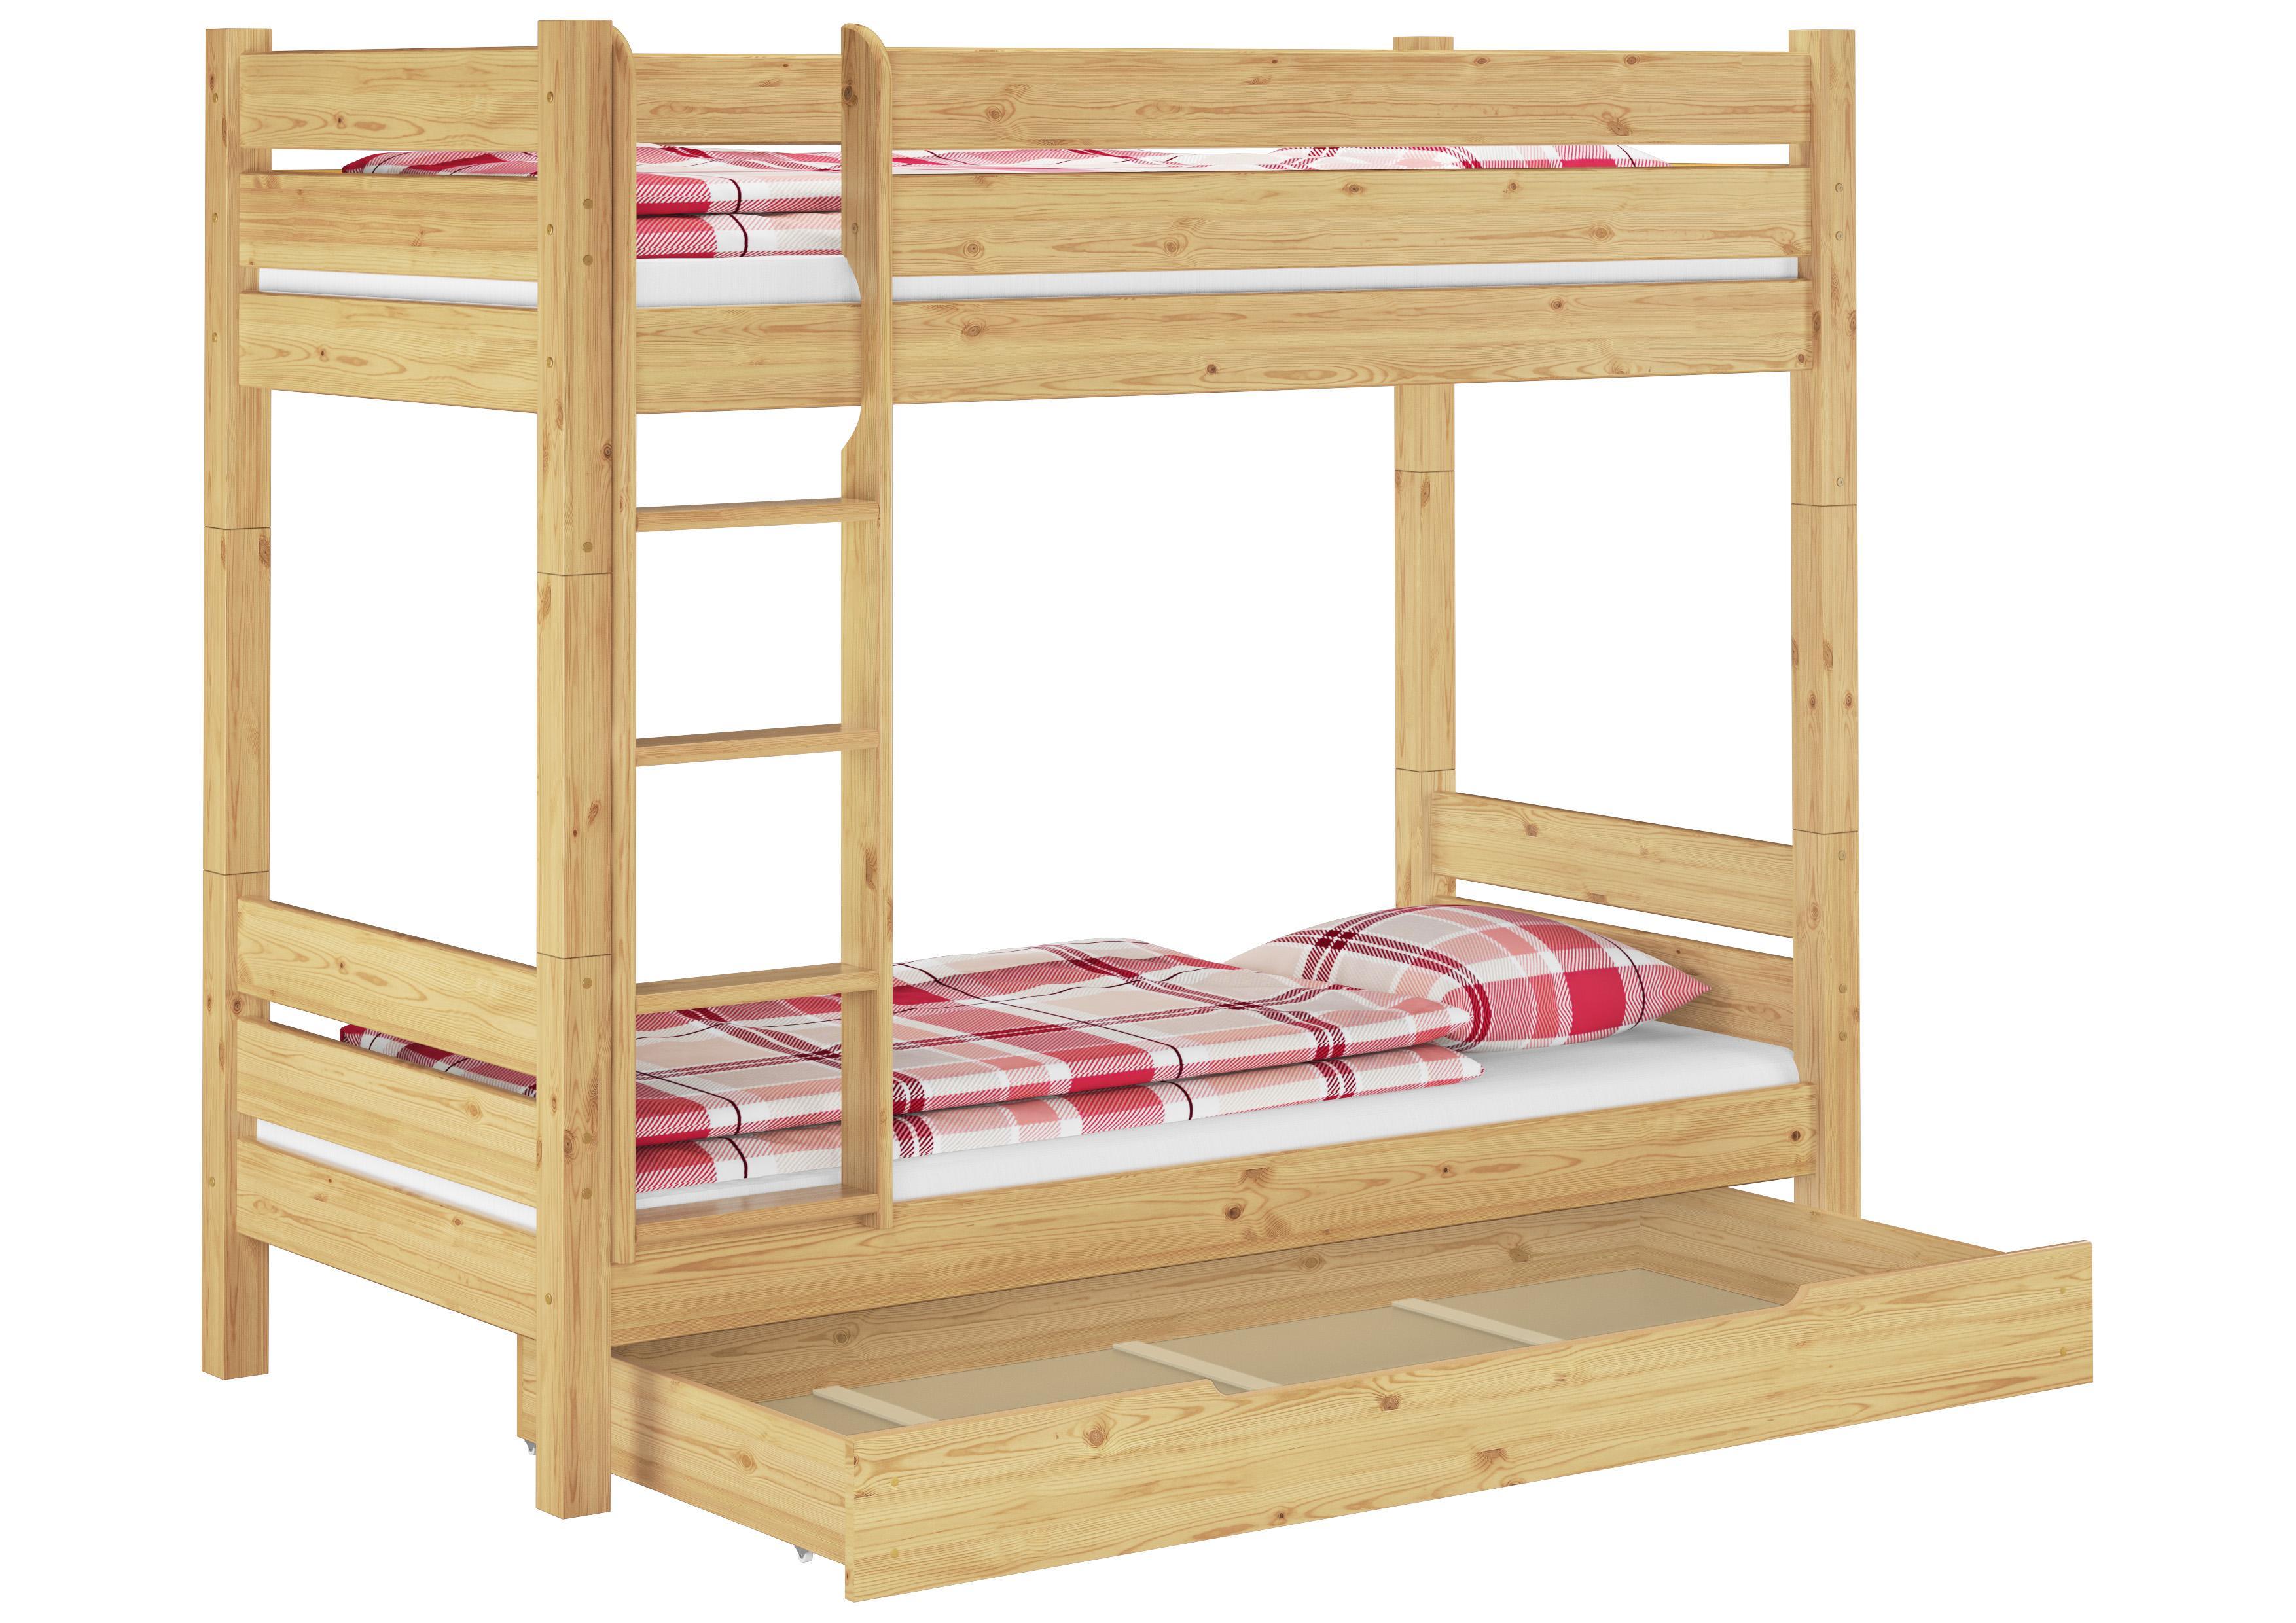 Etagenbett Quba 3 : Erst holz massivholz etagenbett stockbett kiefer teilbar